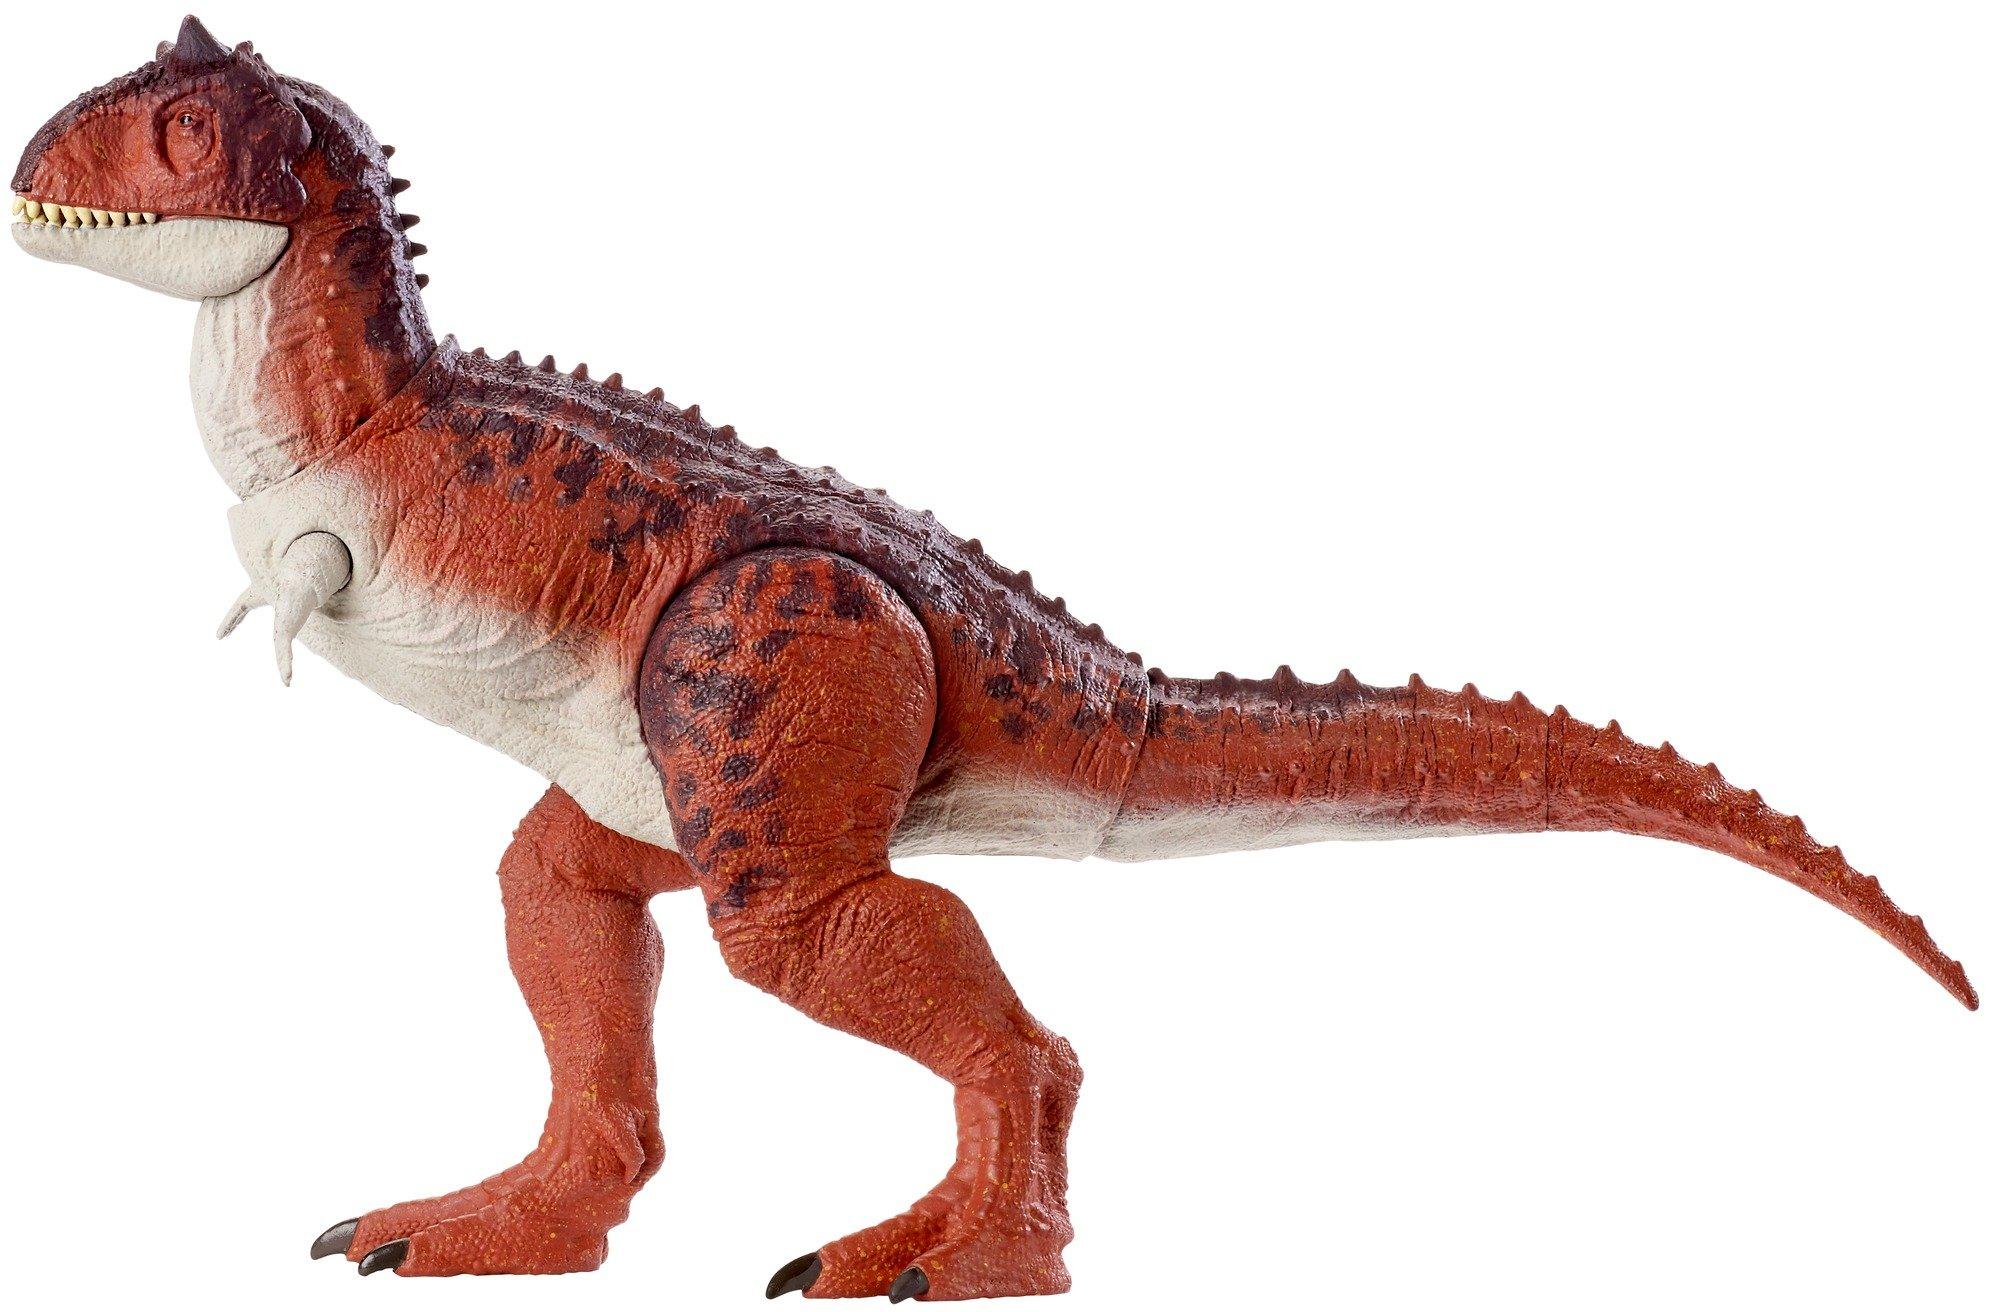 Jurassic World Action Attack Carnotaurus Figure by Jurassic World Toys (Image #4)